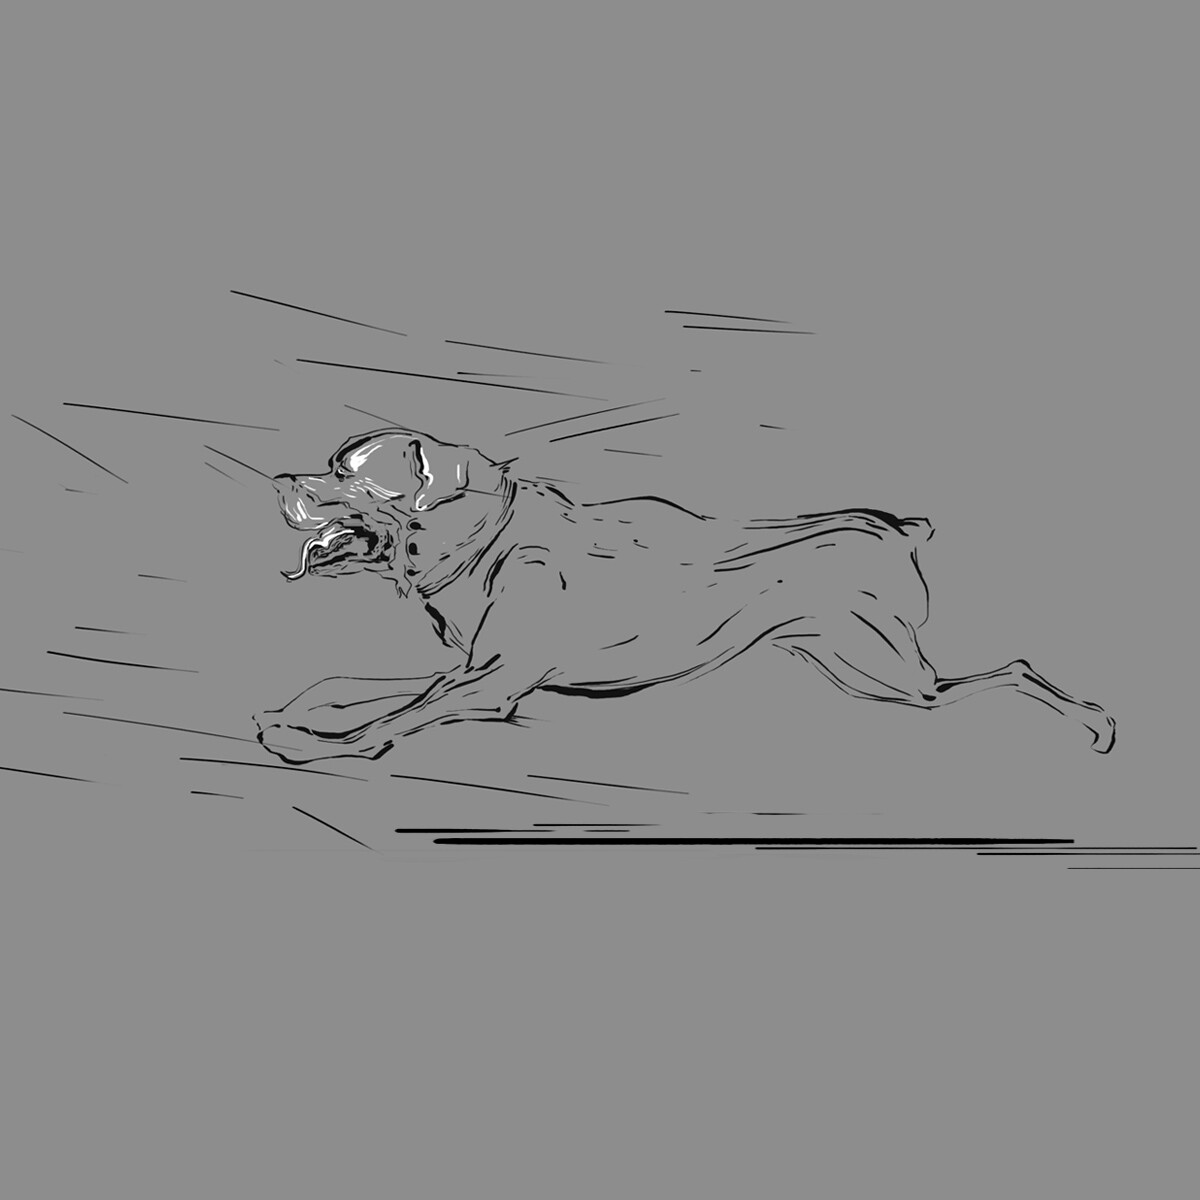 Rottweiler concept scetch 2